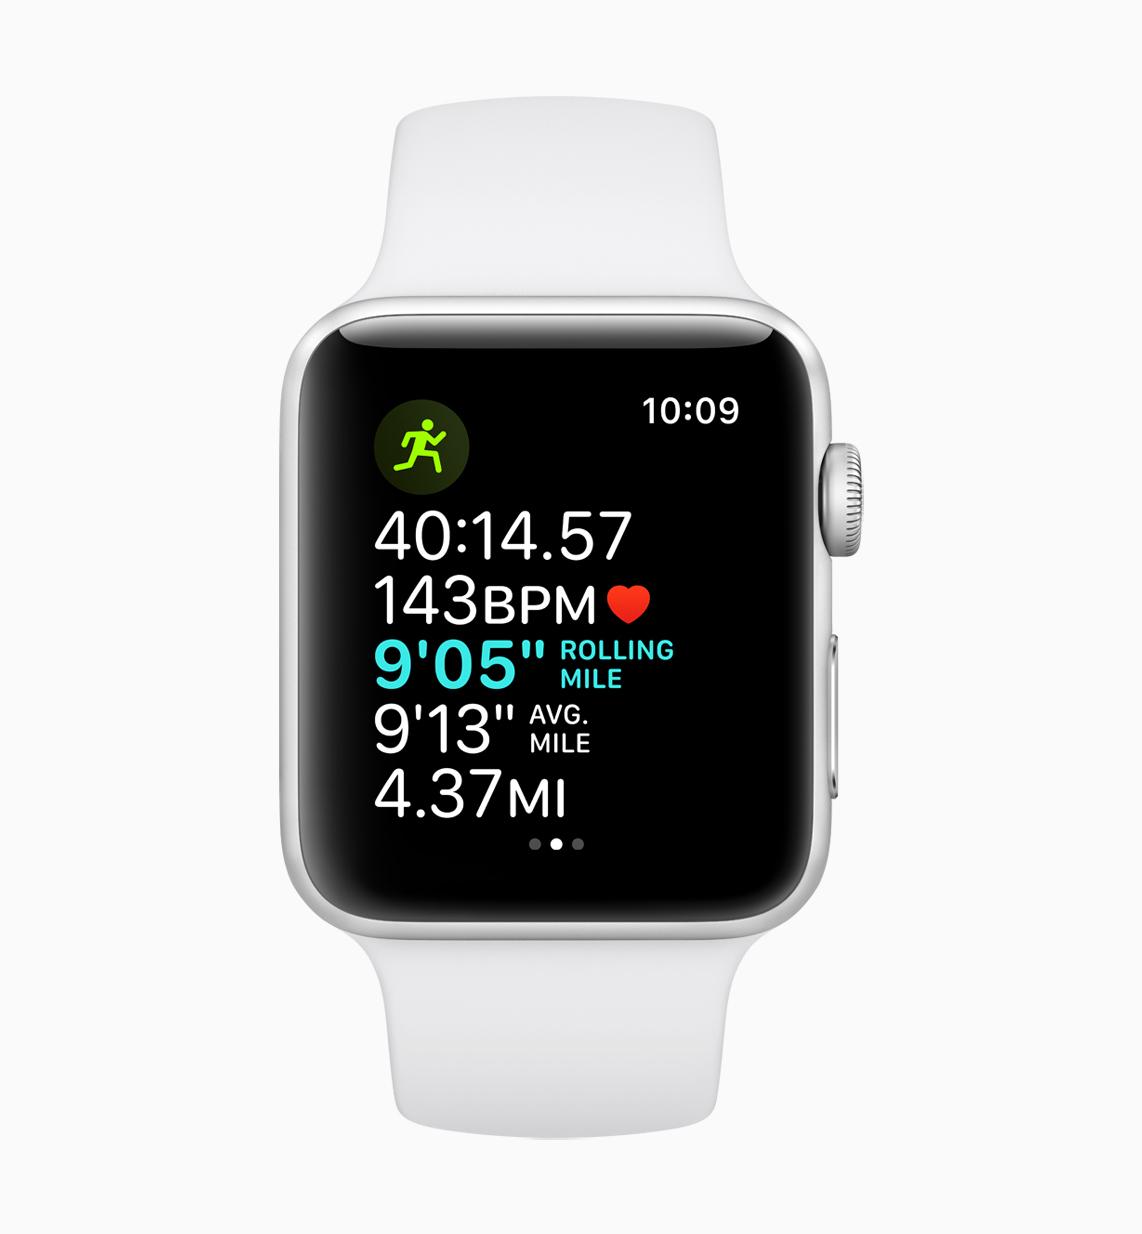 Apple-watchOS_5-Running-Features-screen-06042018.jpg